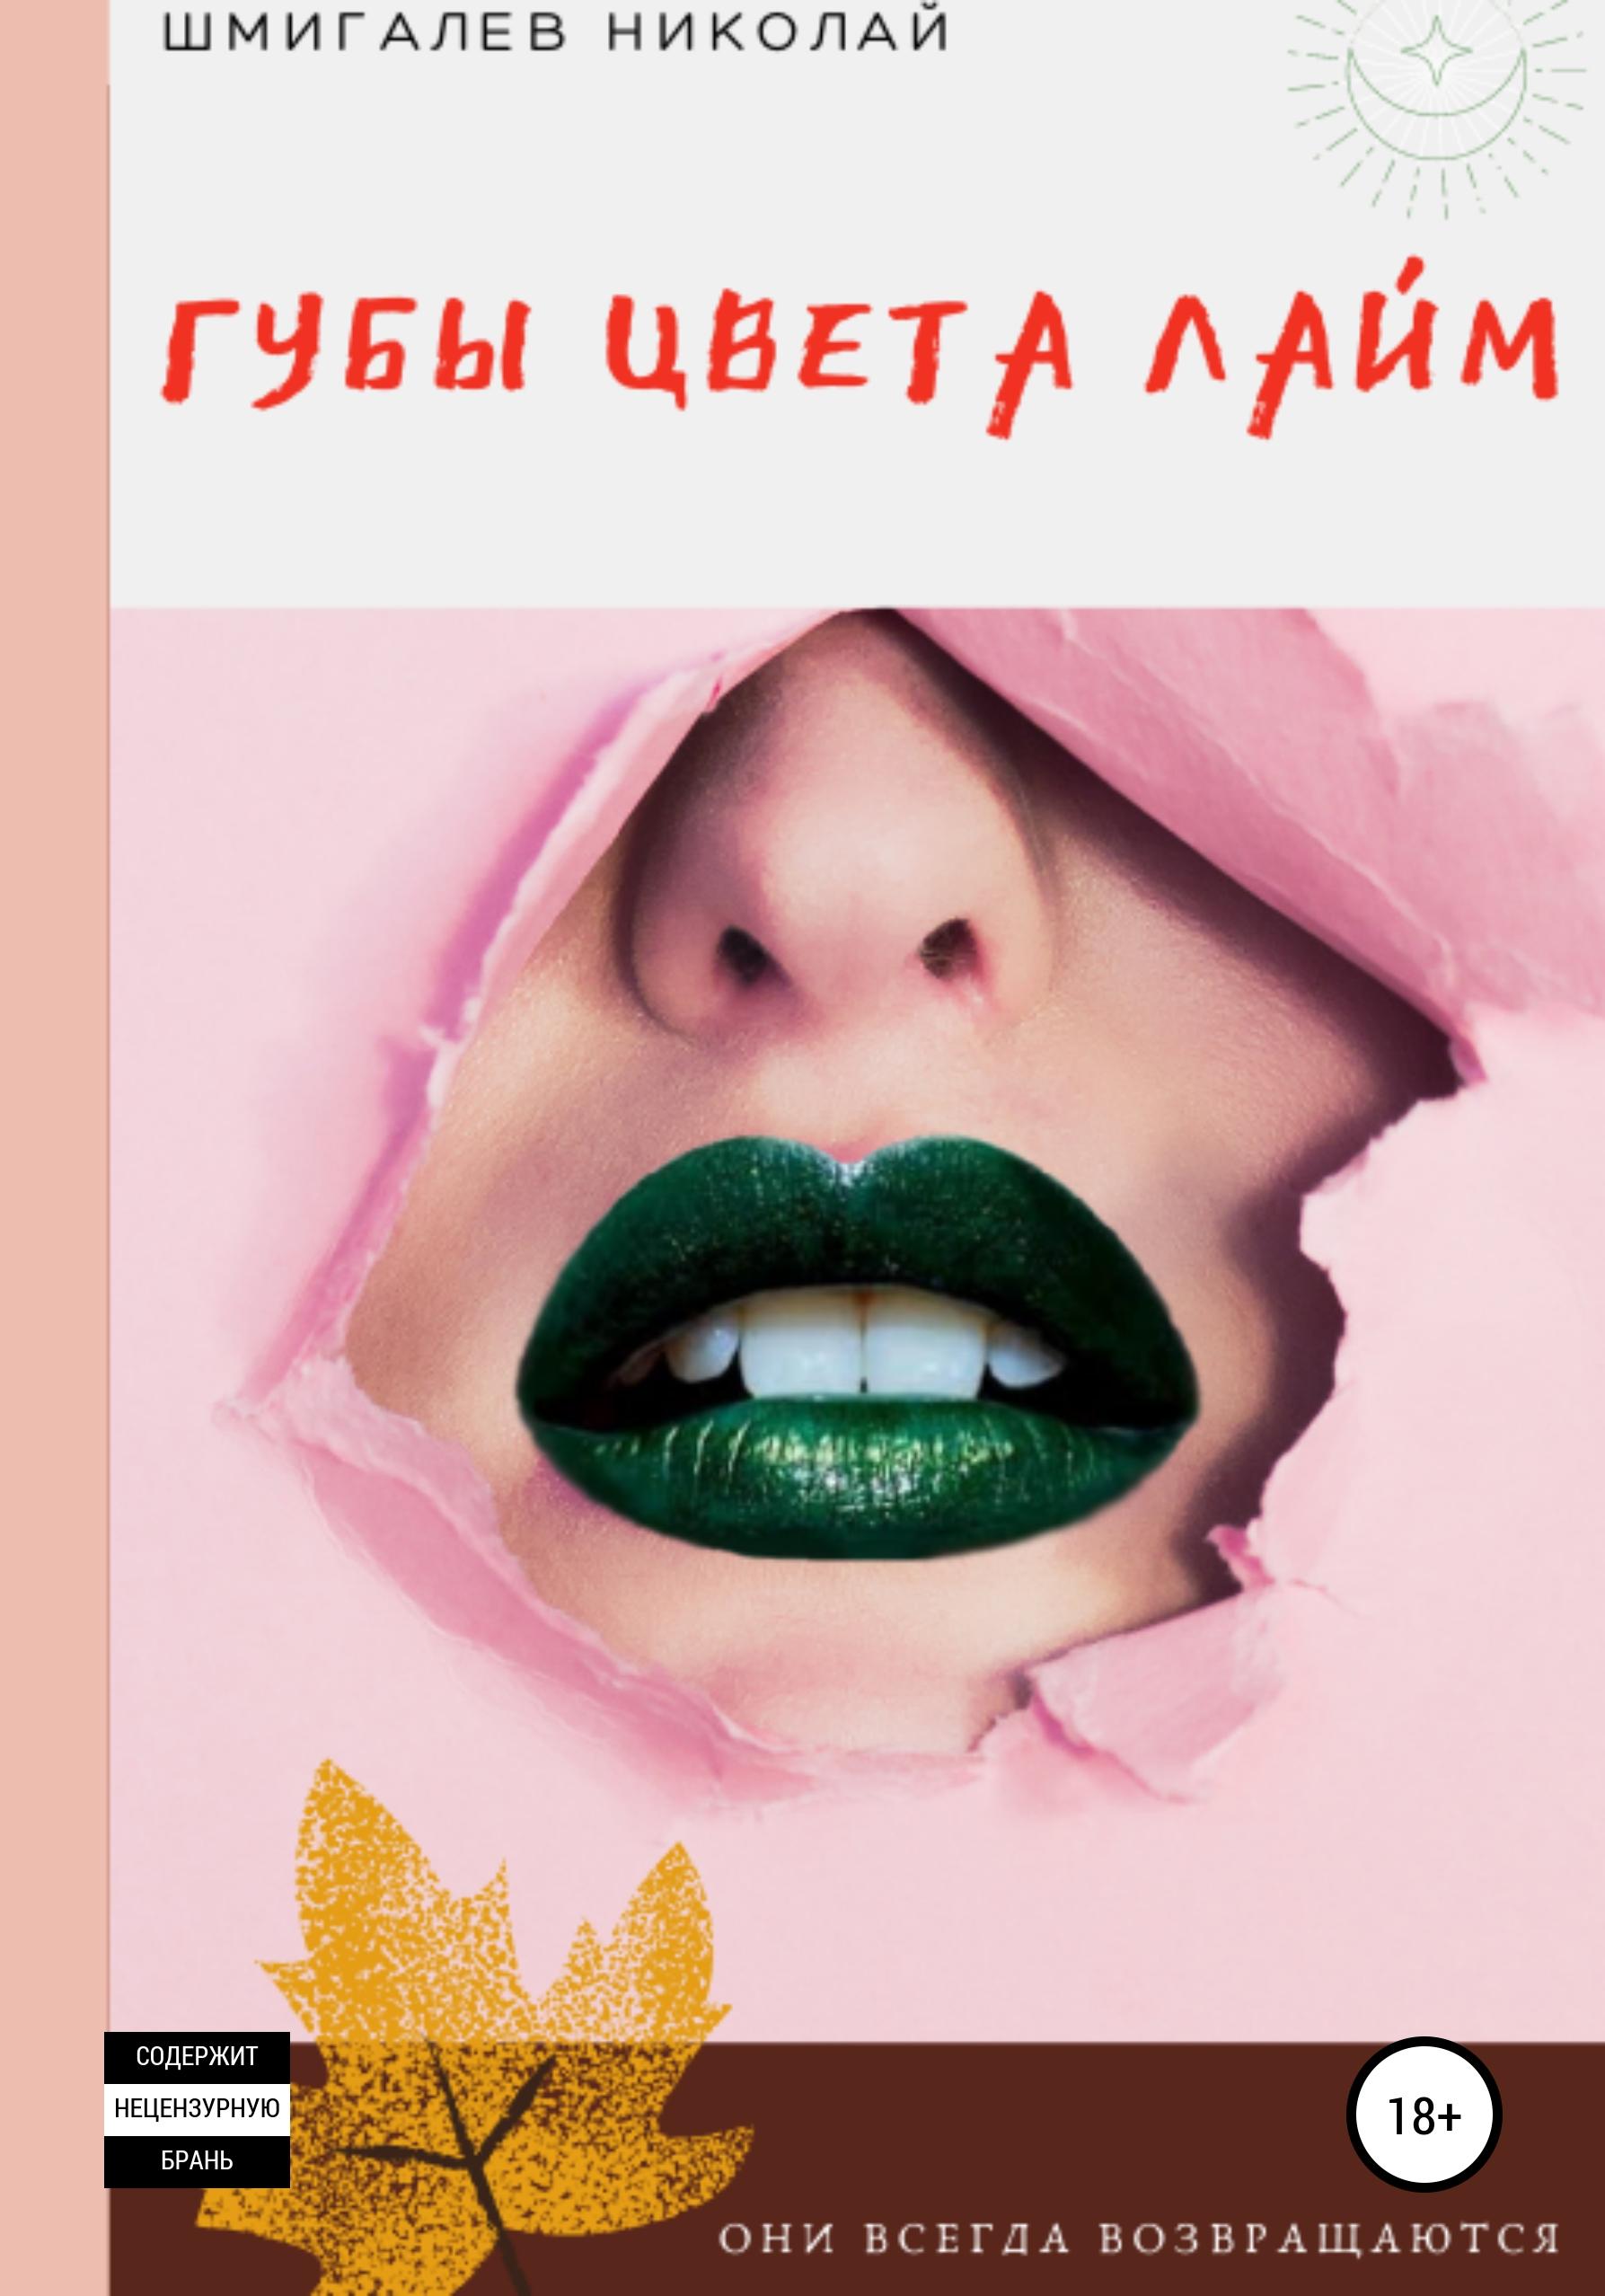 Николай Шмигалев - Губы цвета лайм